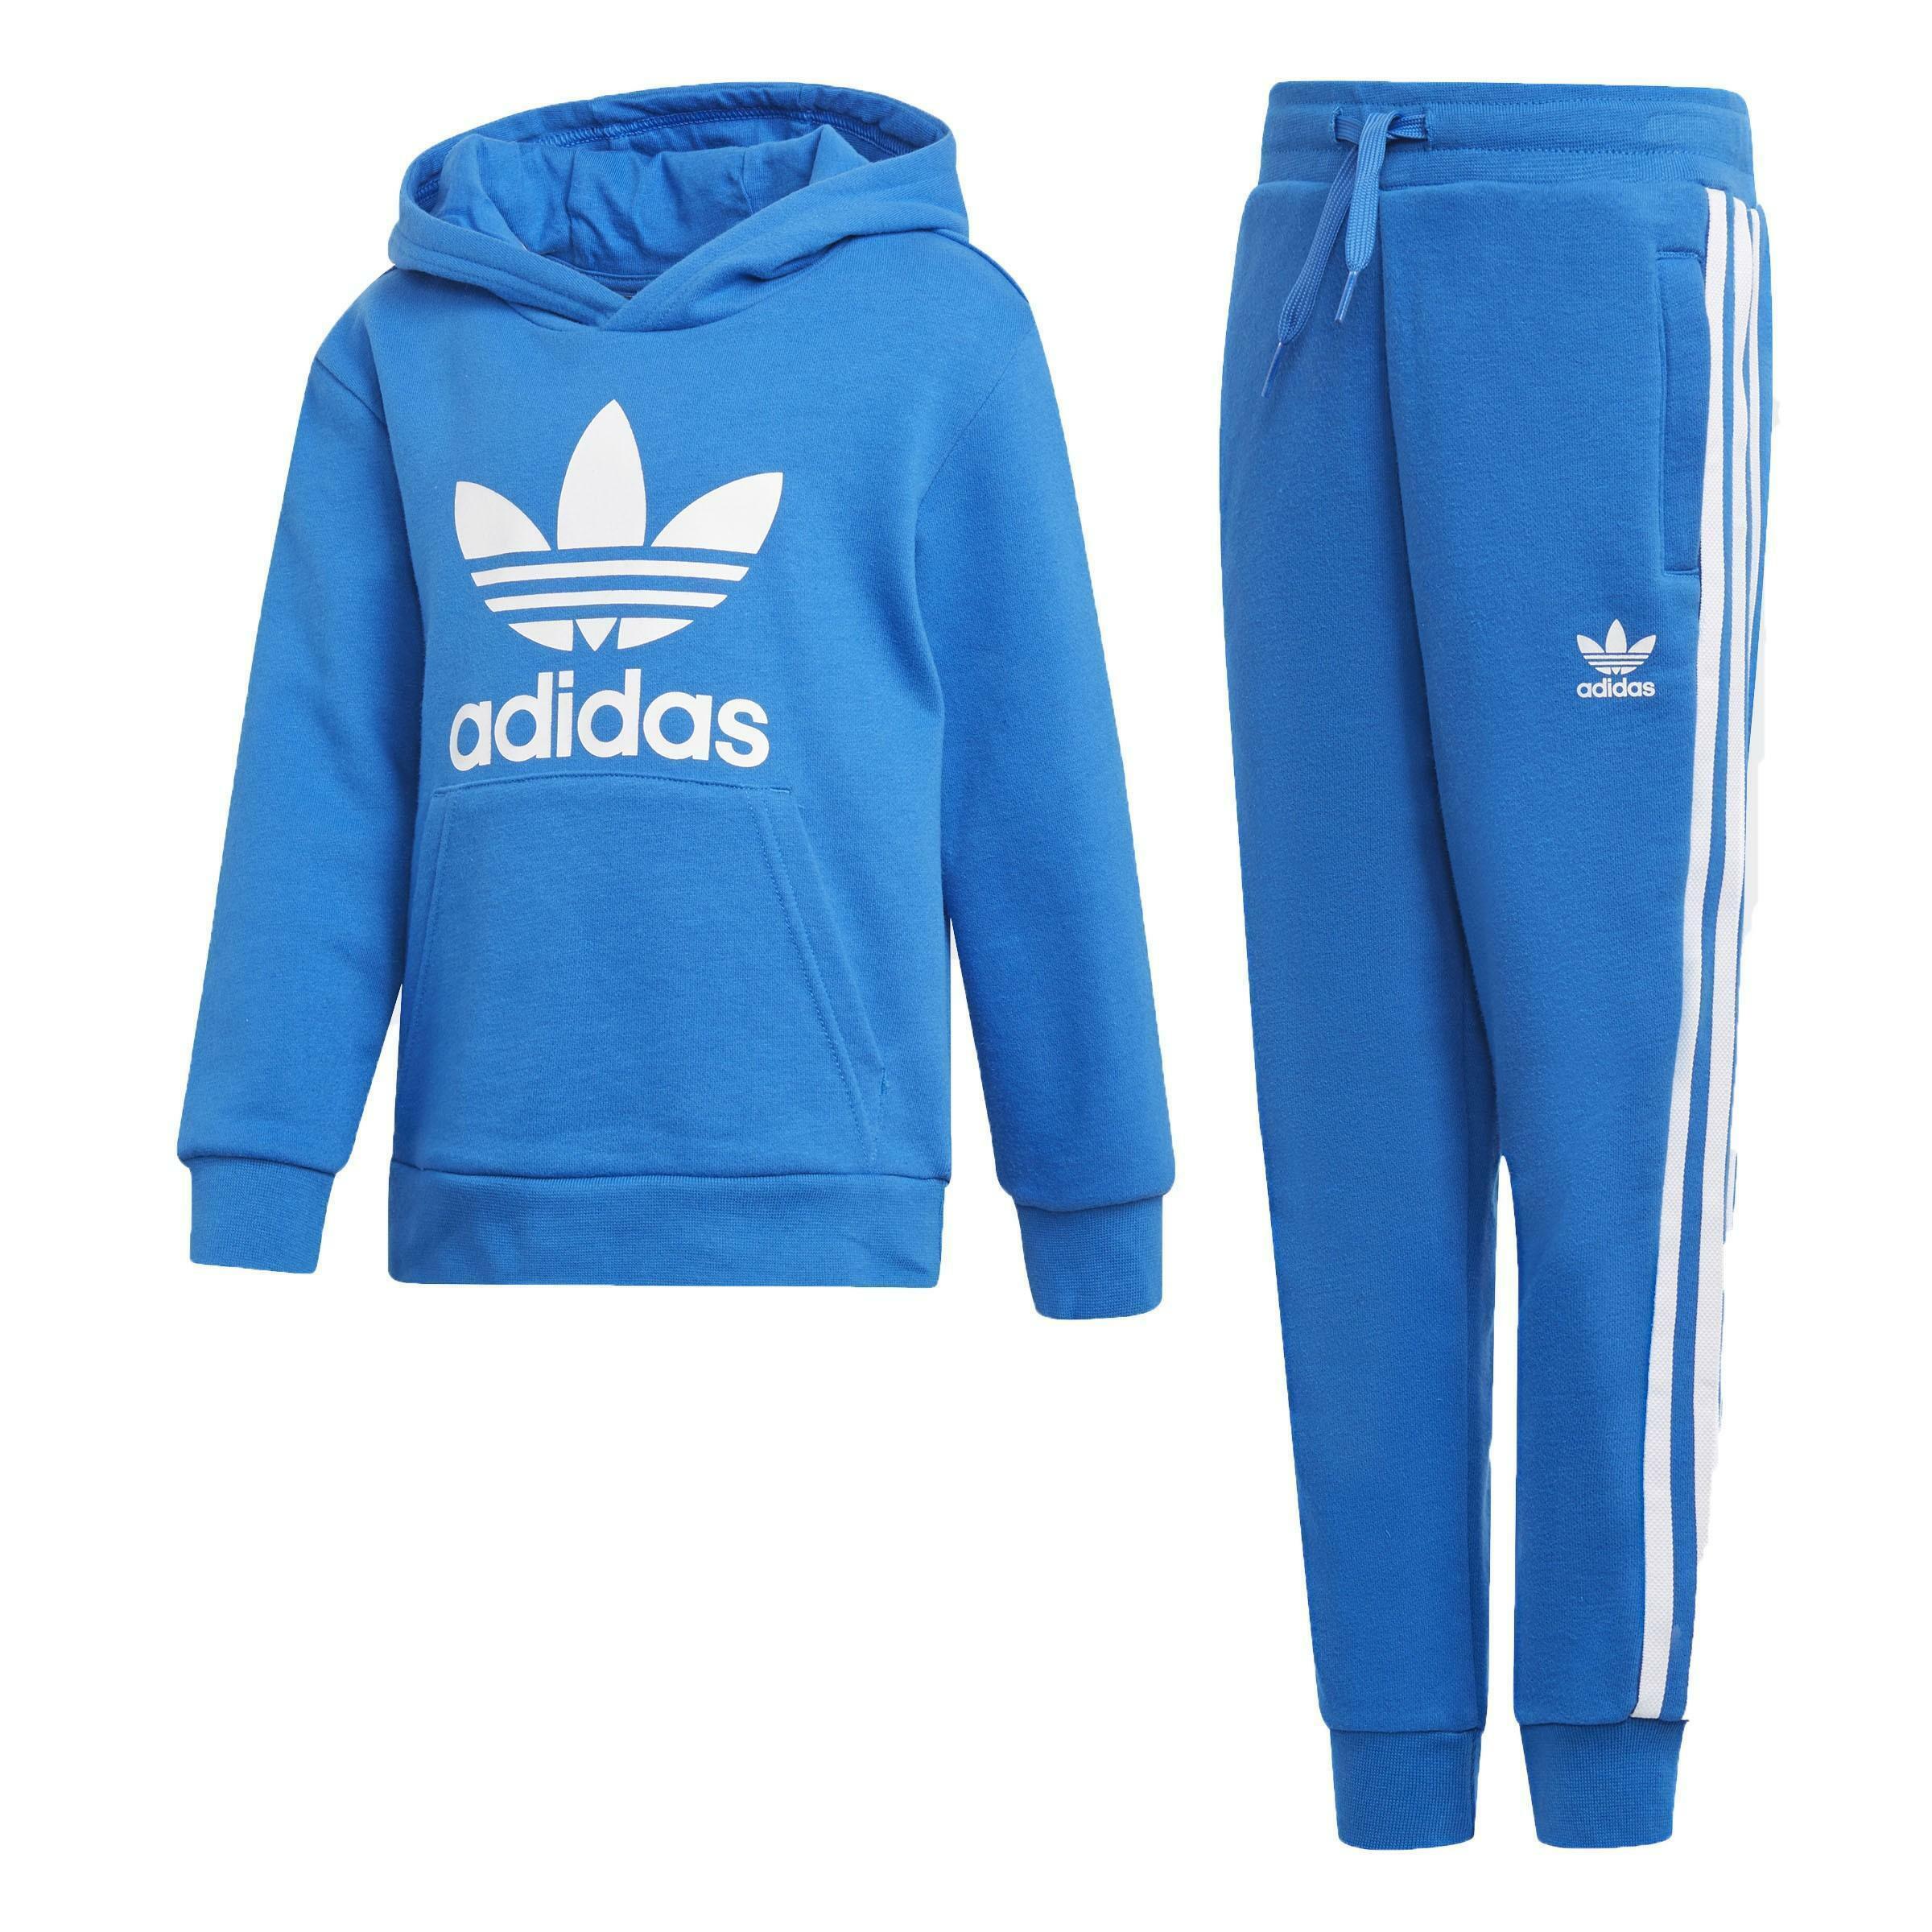 adidas adidas ltrf tuta bambino blu d98858